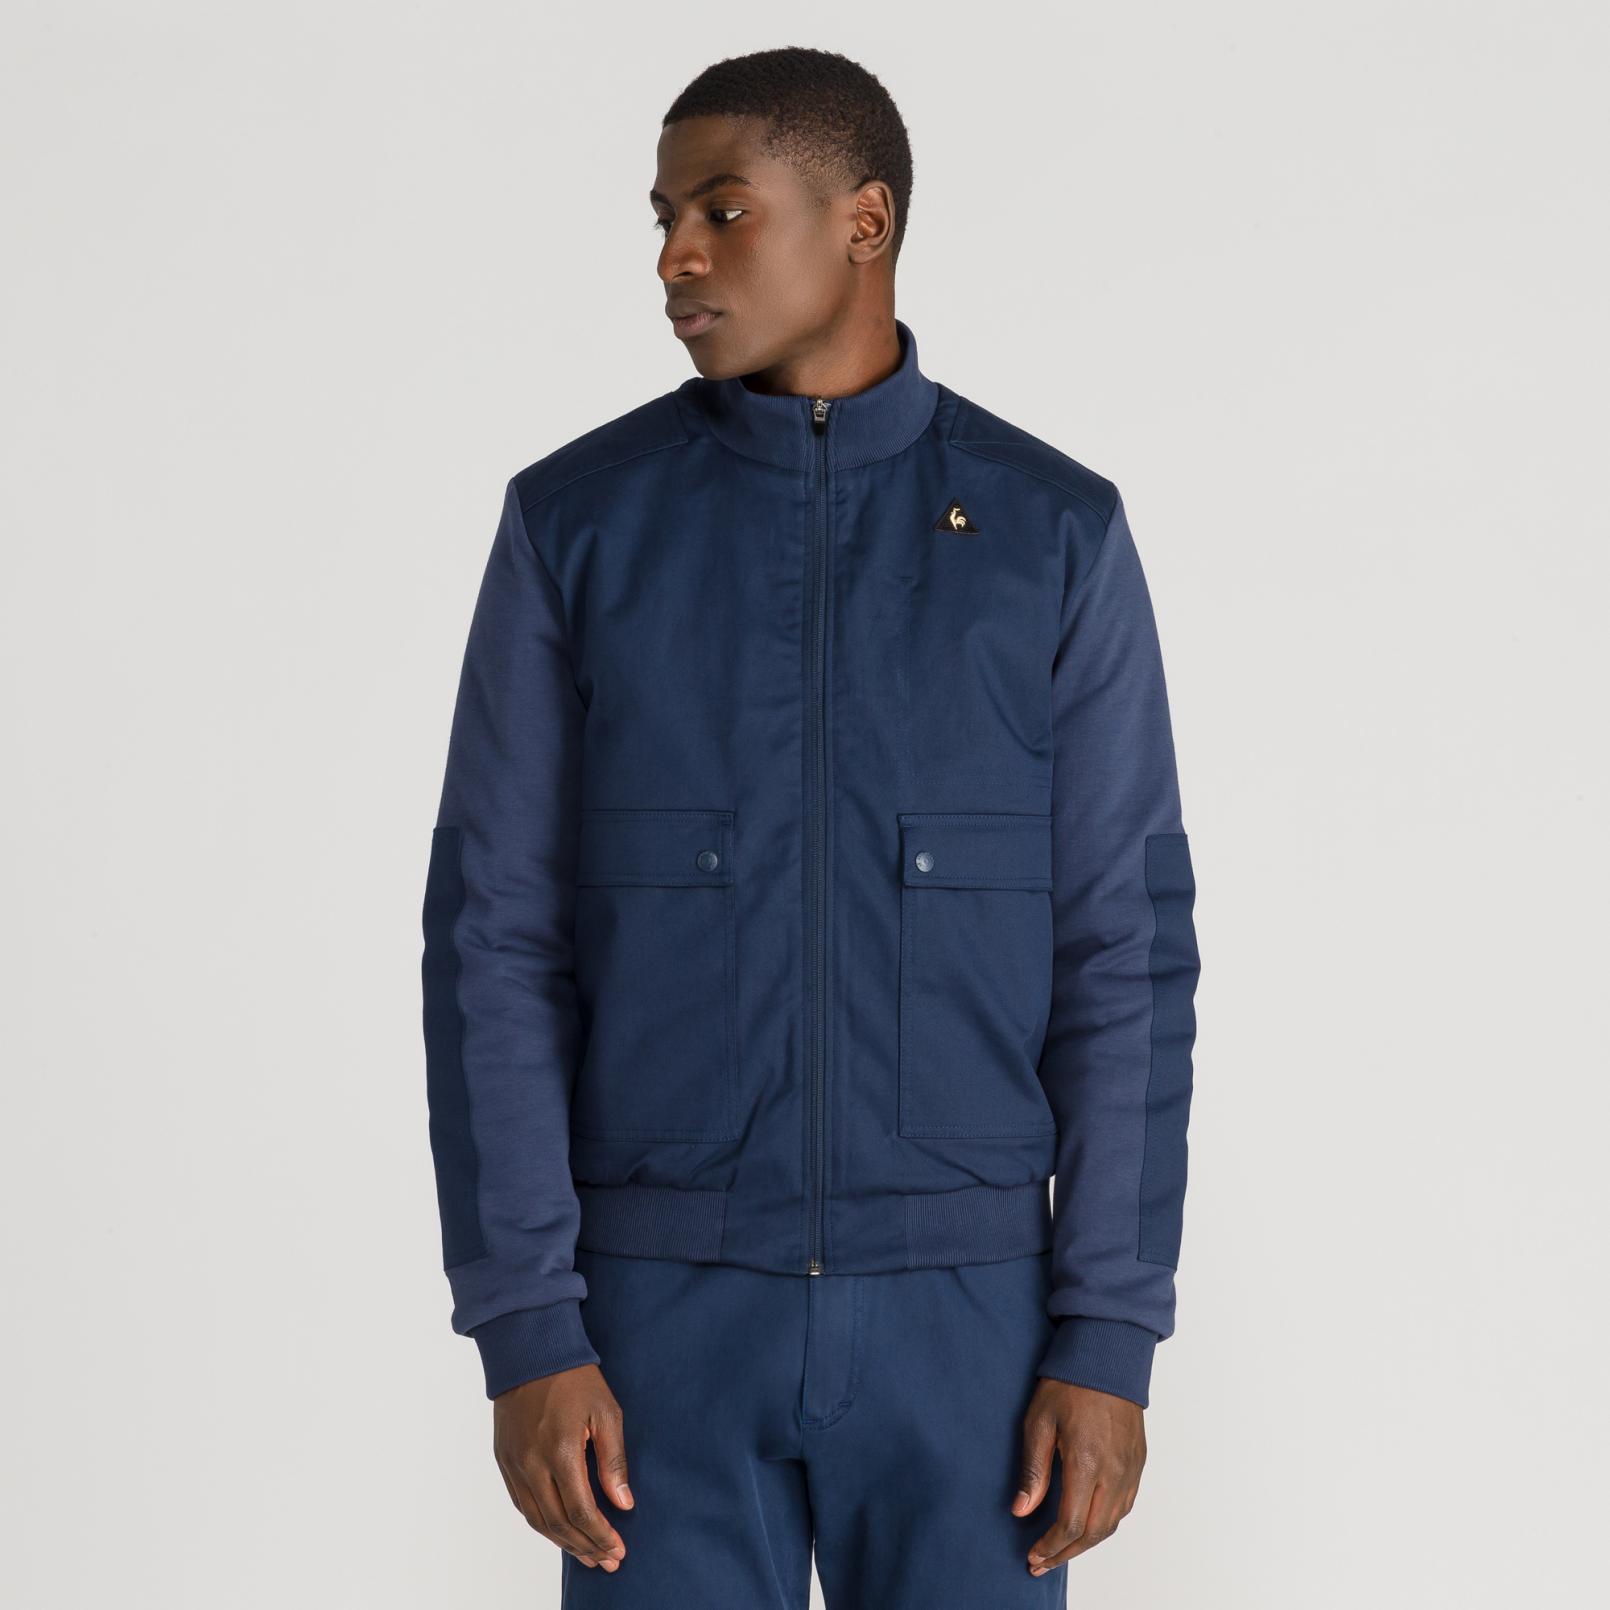 Coats & Jackets – Le Coq Sportif Stadium Bomber Blue